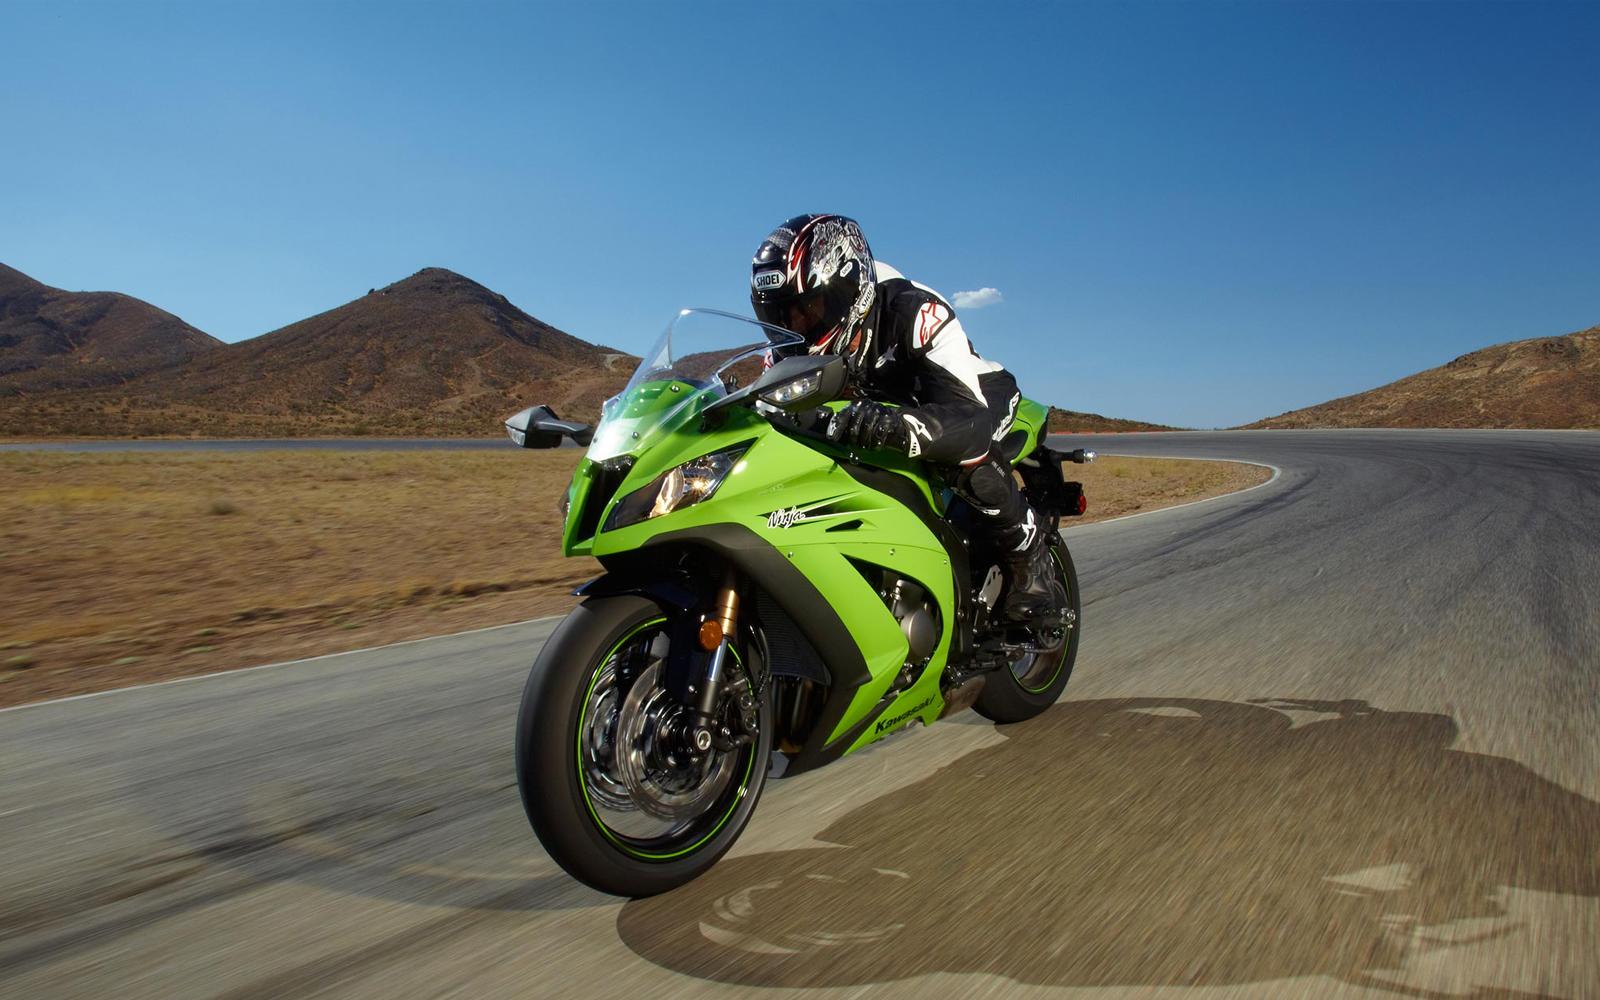 http://4.bp.blogspot.com/-w93HbE18eNI/ULs8FsUvqeI/AAAAAAAAXlc/4G-KsaCYqks/s1600/Kawasaki+Ninja+ZX-10R+7.jpg